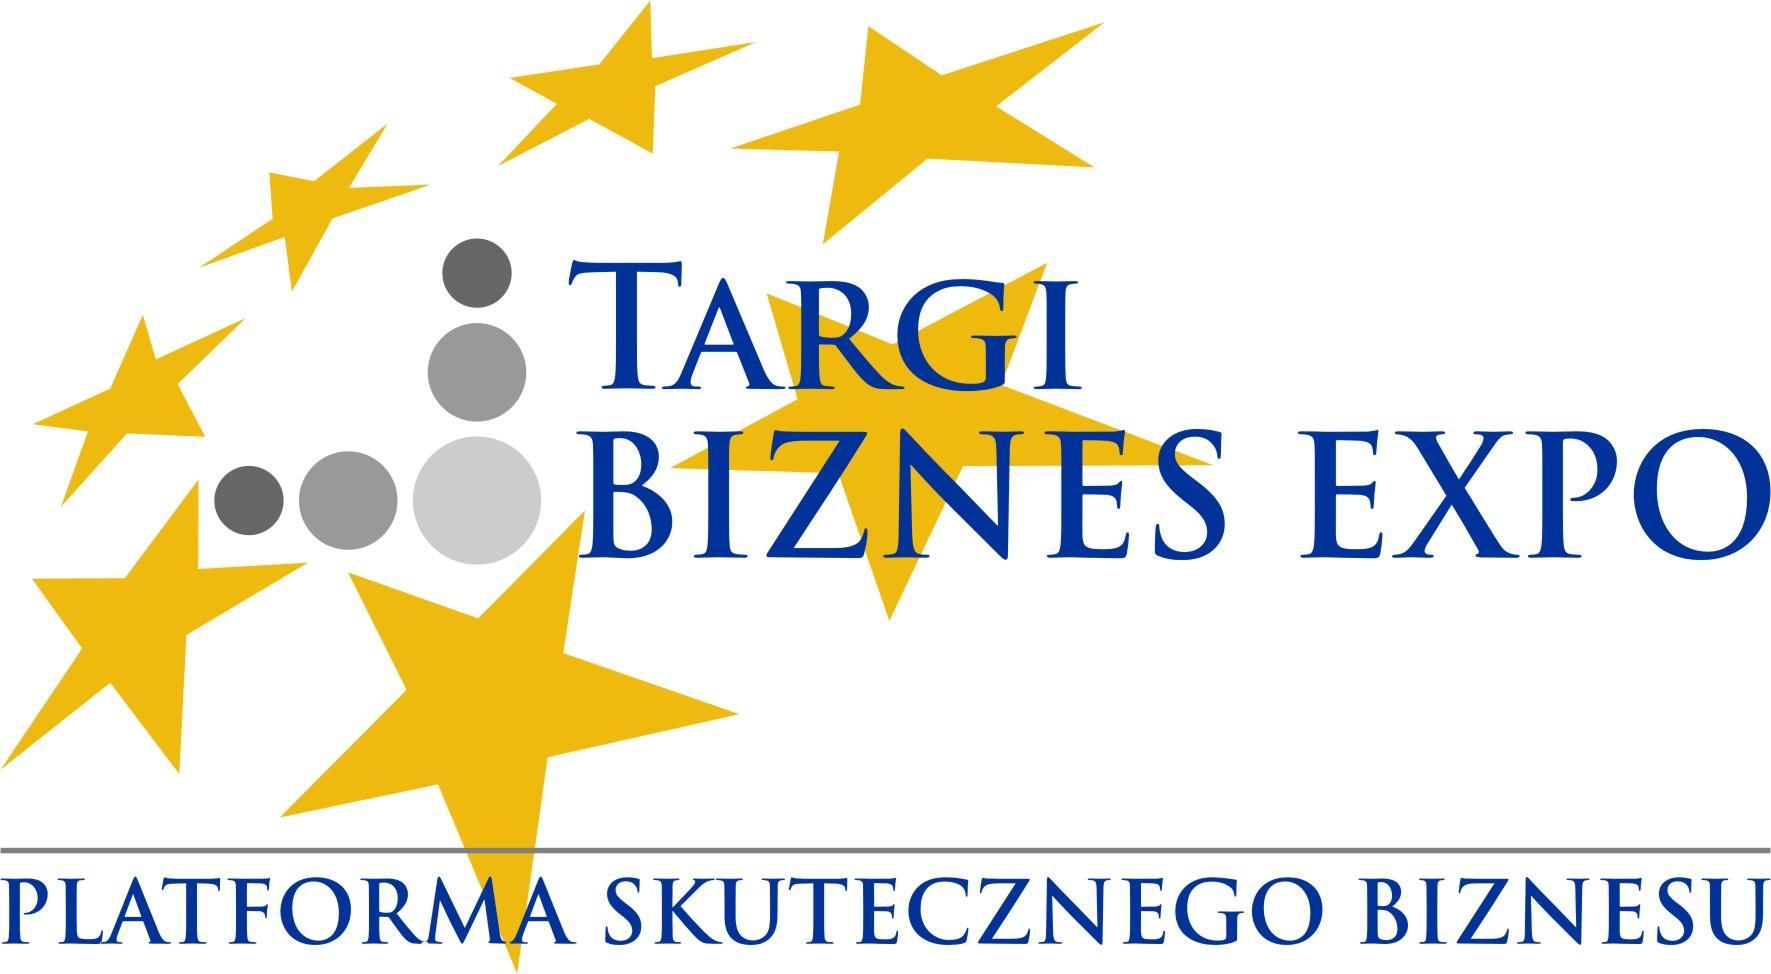 Targi Biznes Expo 2014